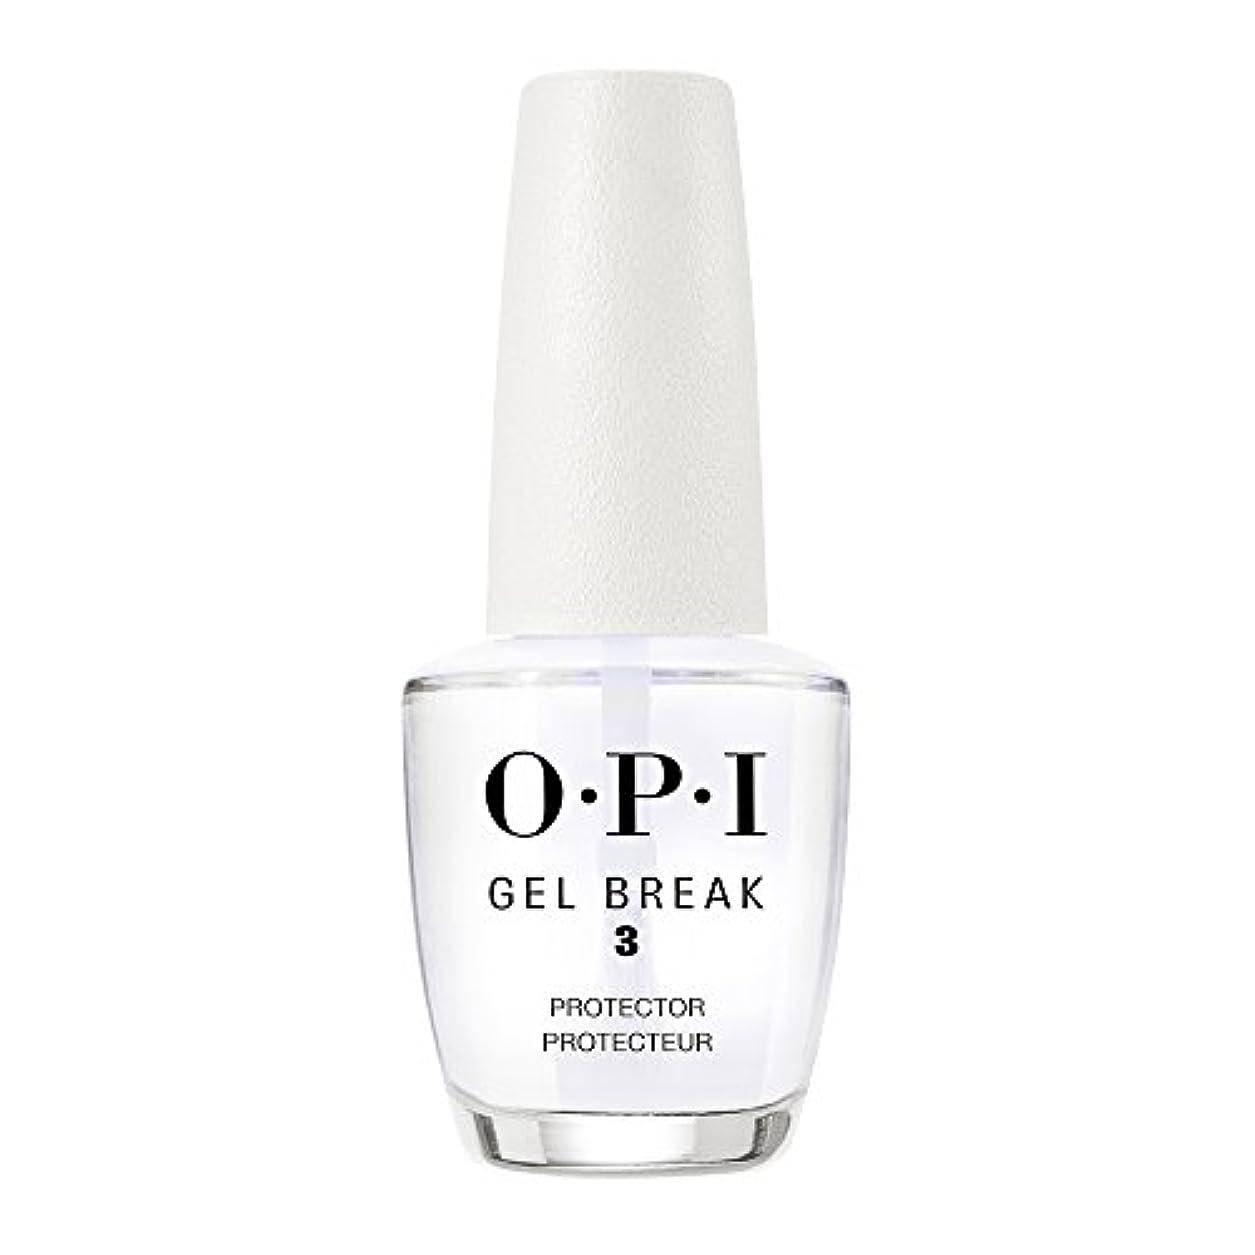 OPI(オーピーアイ) ジェルブレイク プロテクター トップコート